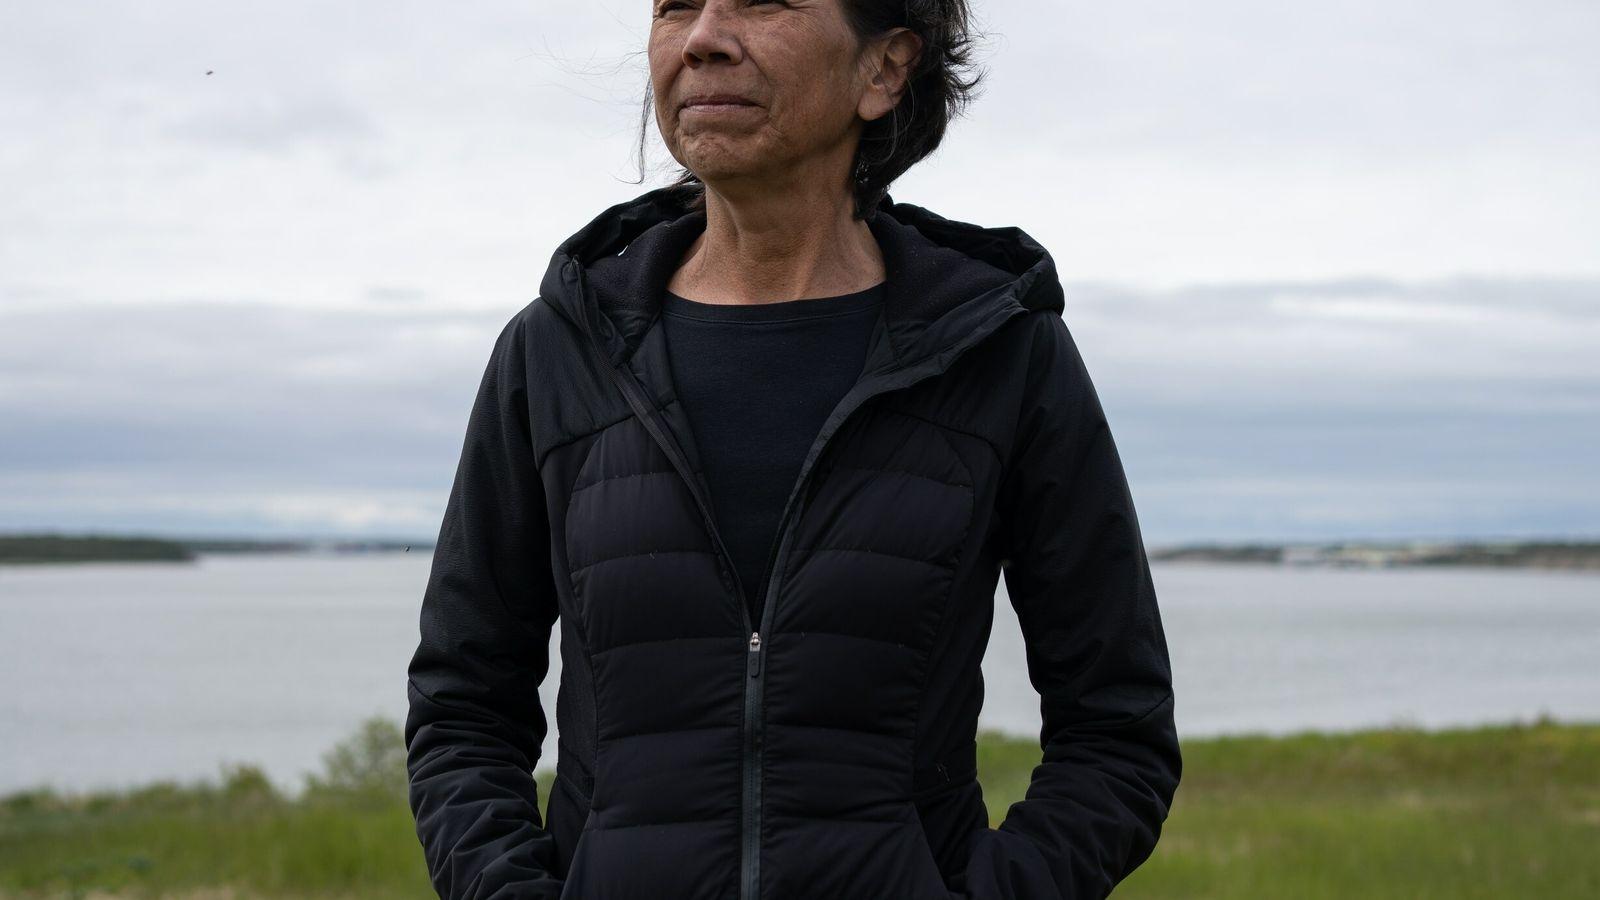 Roylene Gottschalk